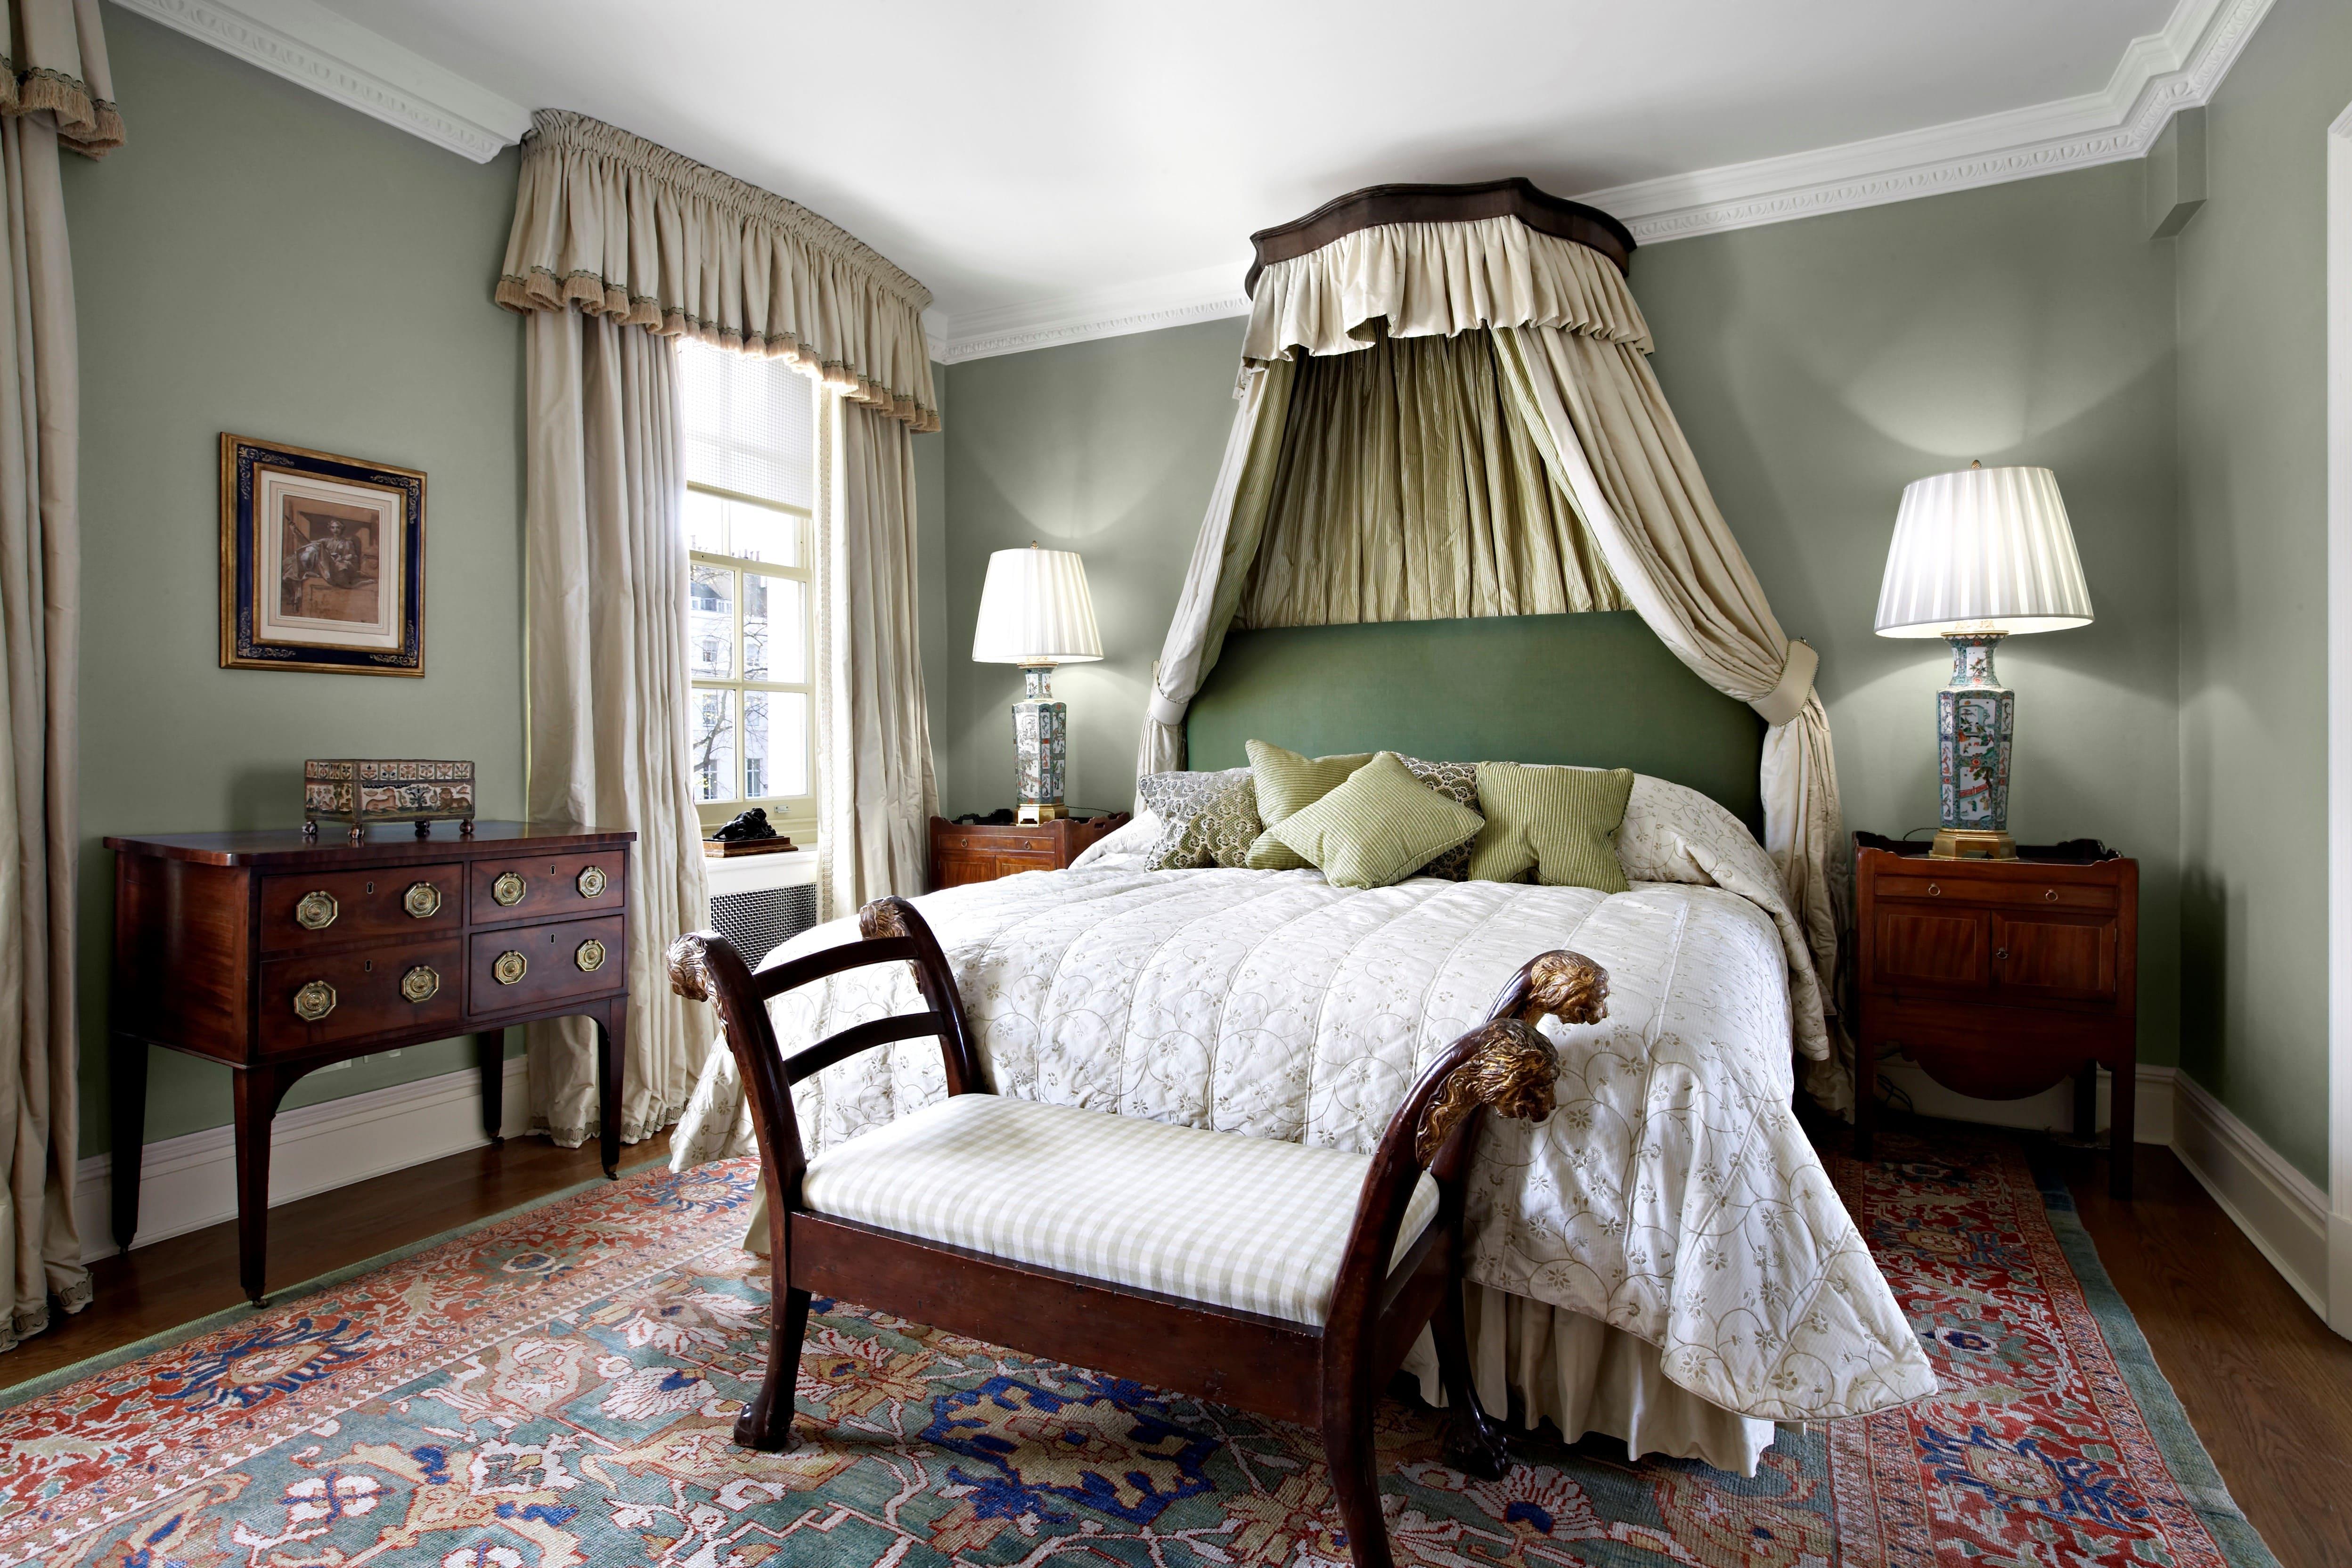 Fashion-designer-bedroom-ideas-with-52-modern-design-for